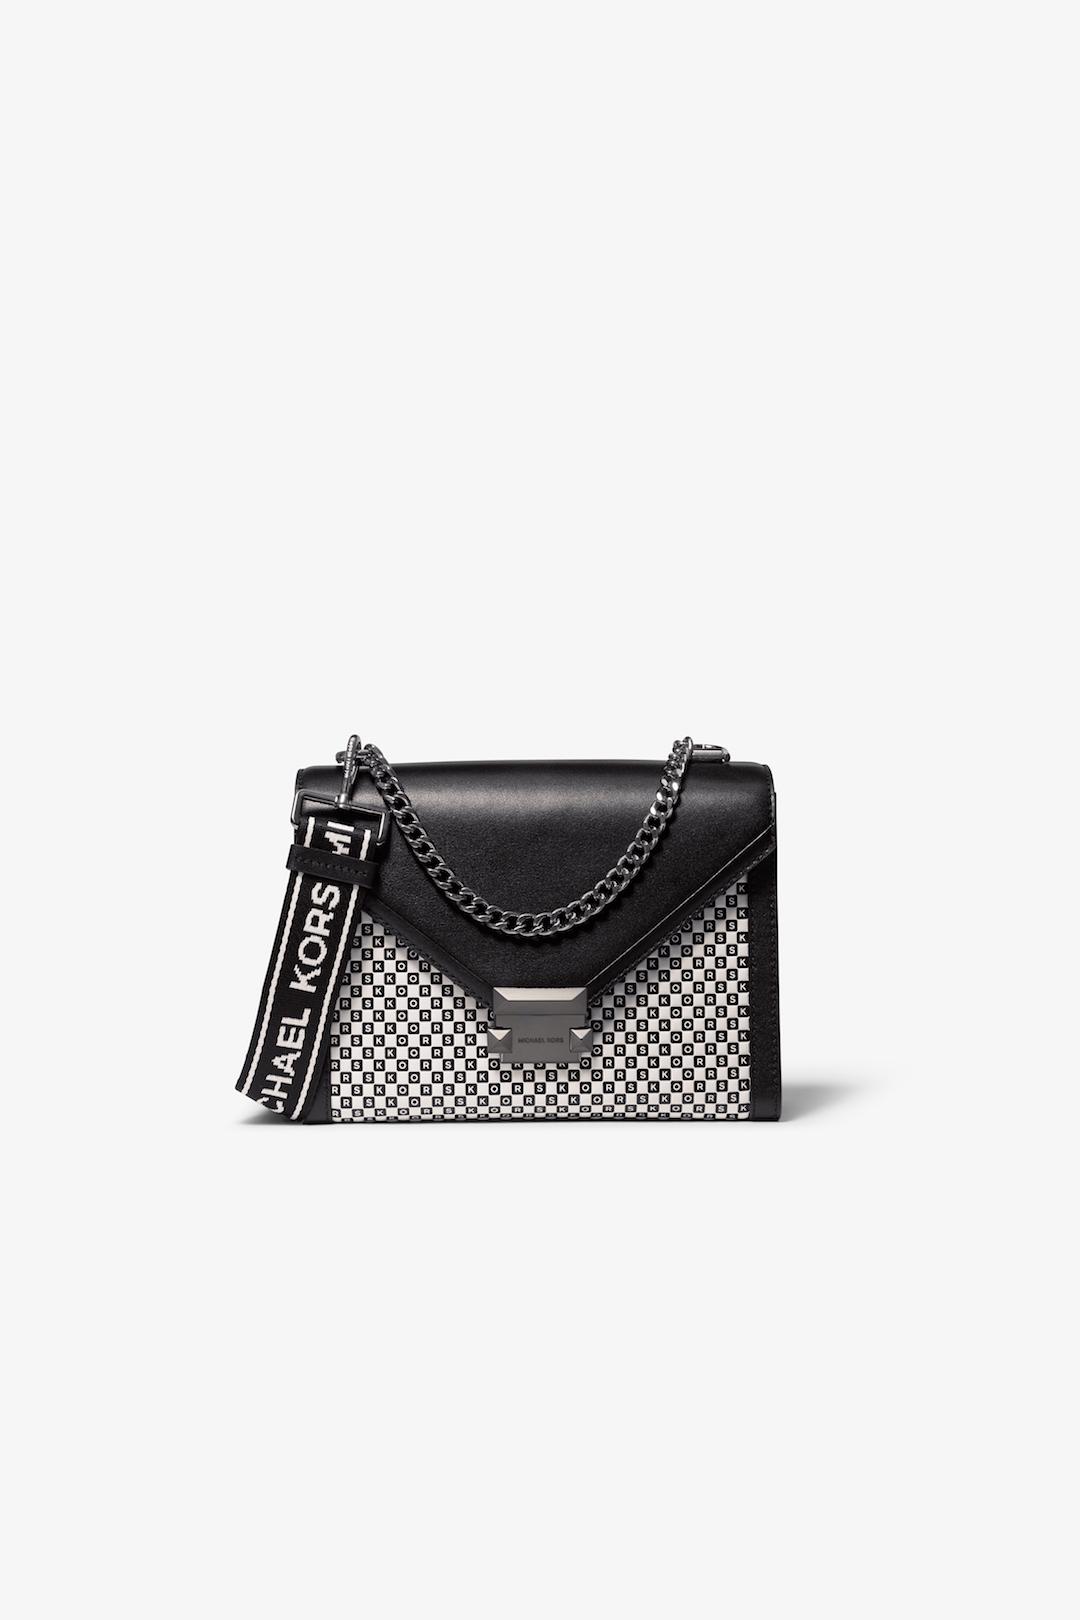 MICHAEL Michael Kors Checkered Leather Whitney Shoulder Bag.jpg